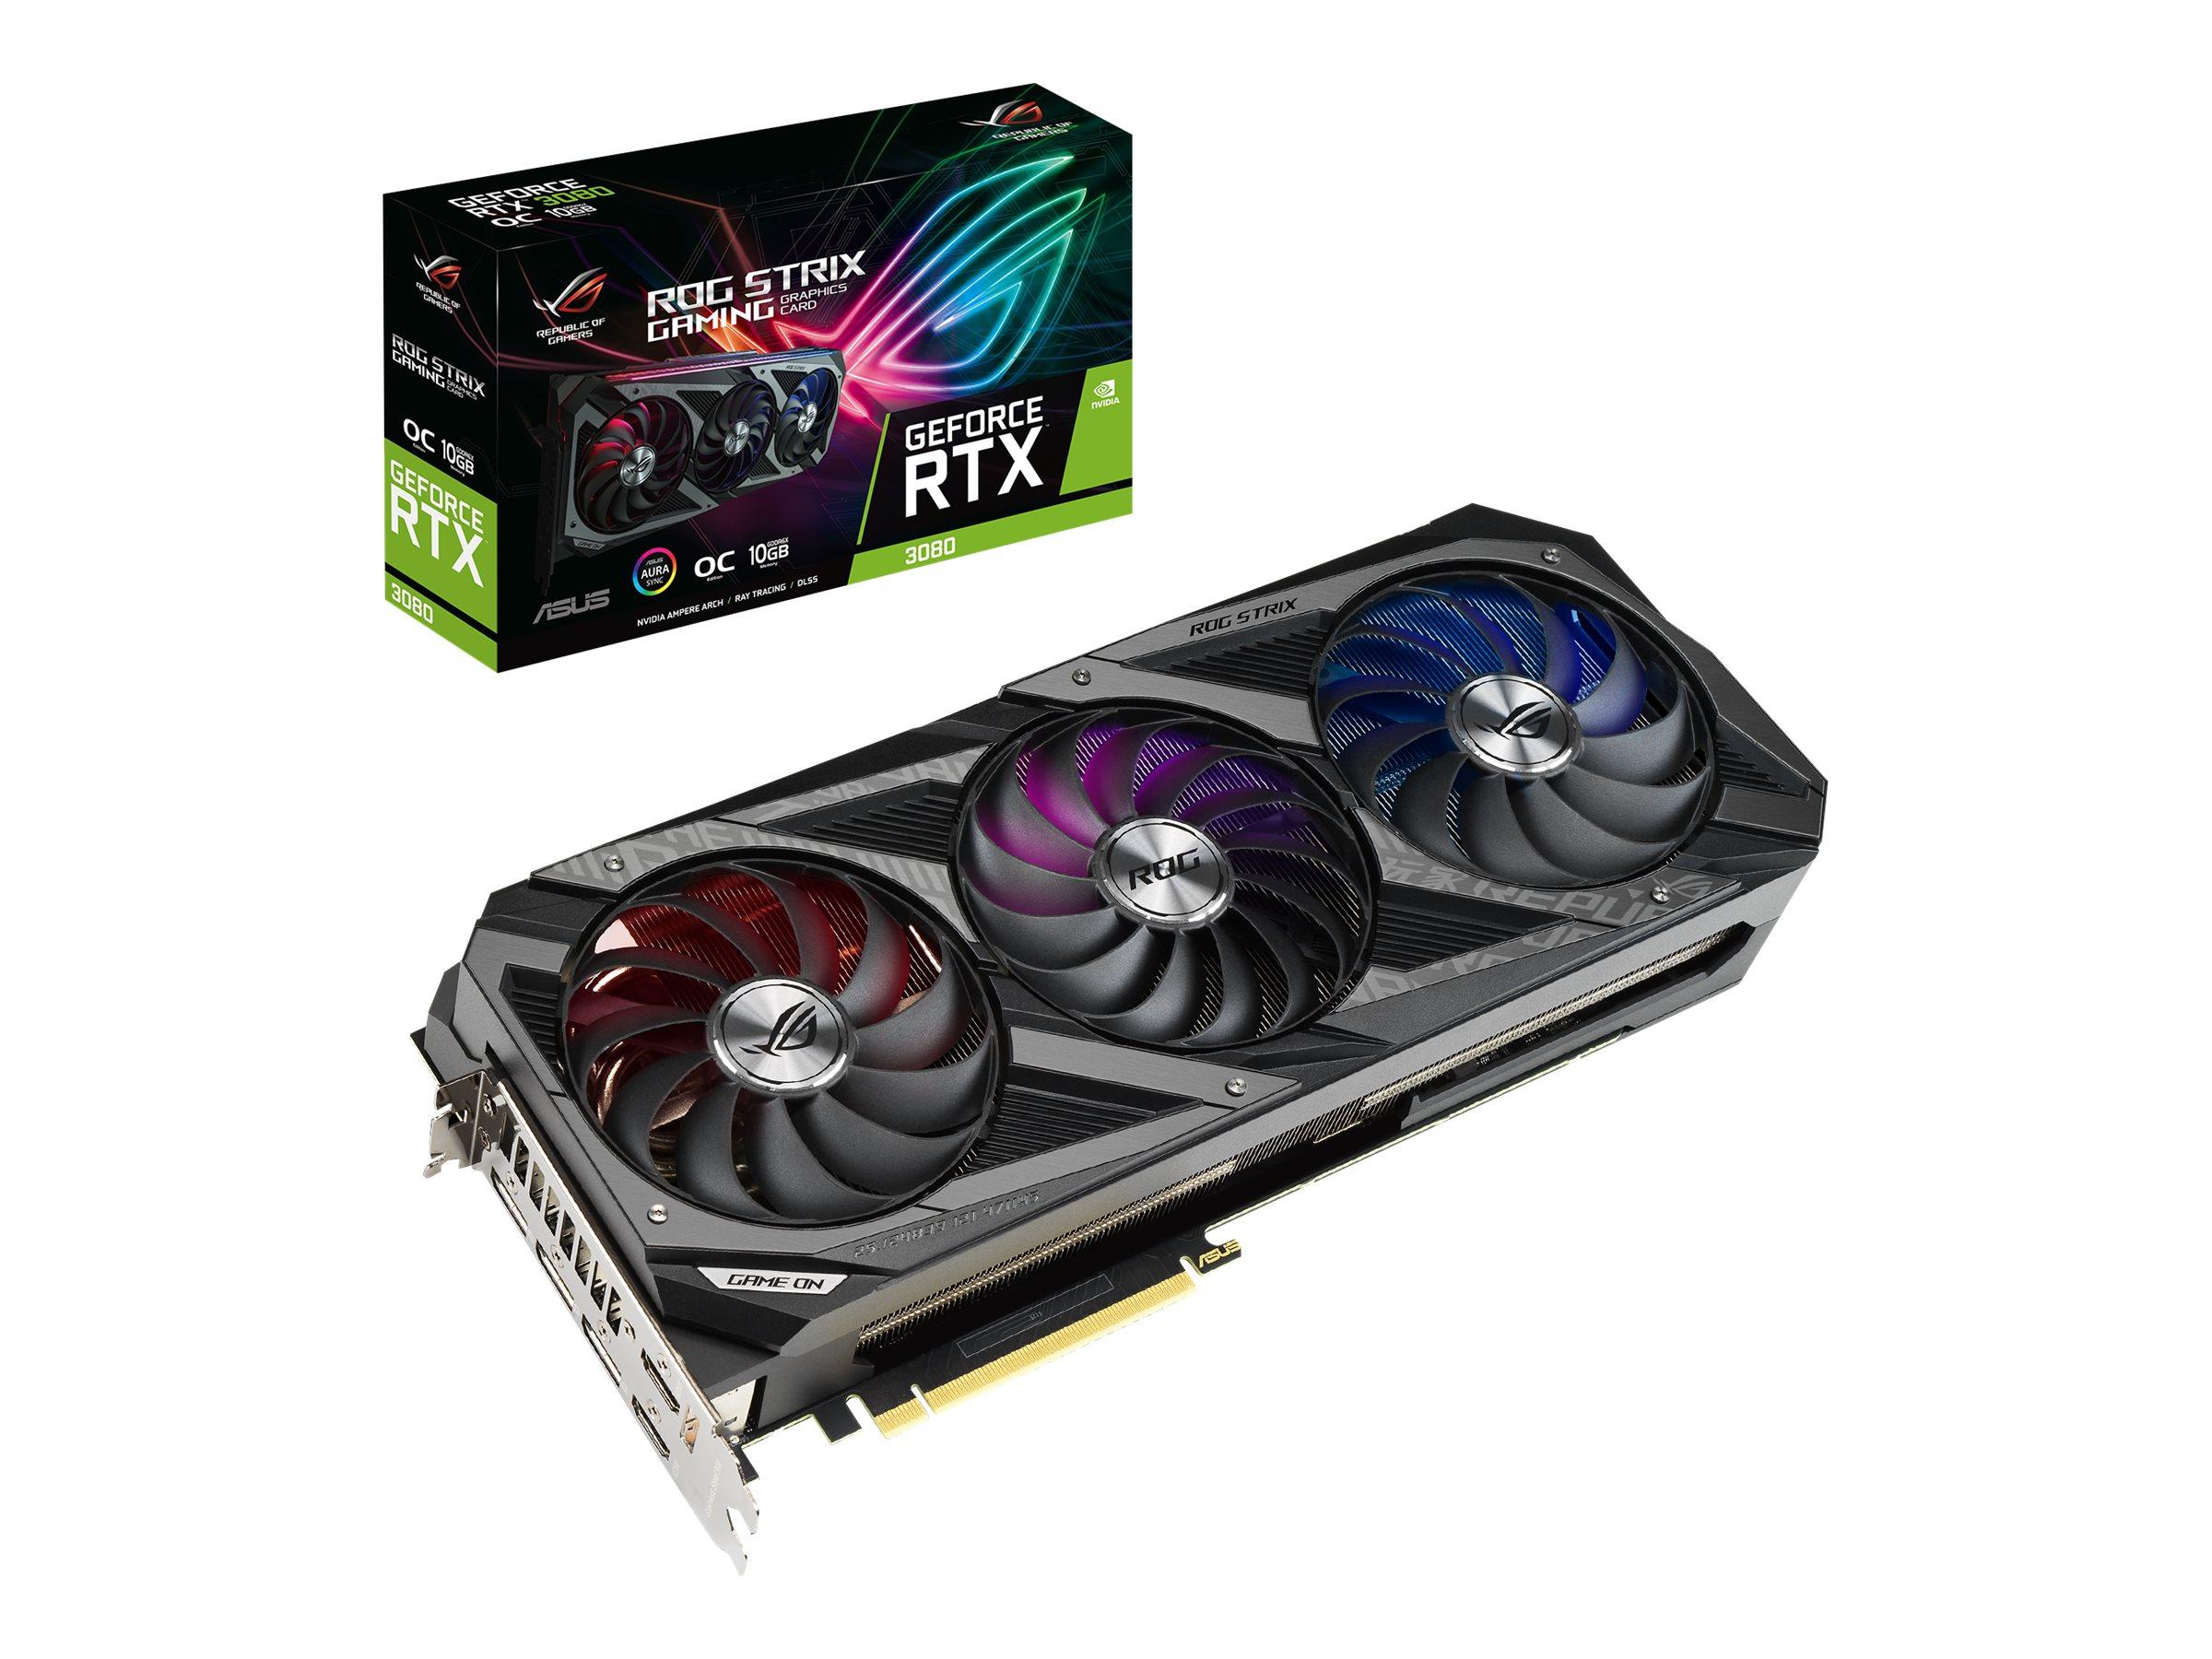 ASUS ROG-STRIX-RTX3080-O10G-GAMING - OC Edition - Grafikkarten - GF RTX 3080 - 10 GB GDDR6X - PCIe 4.0